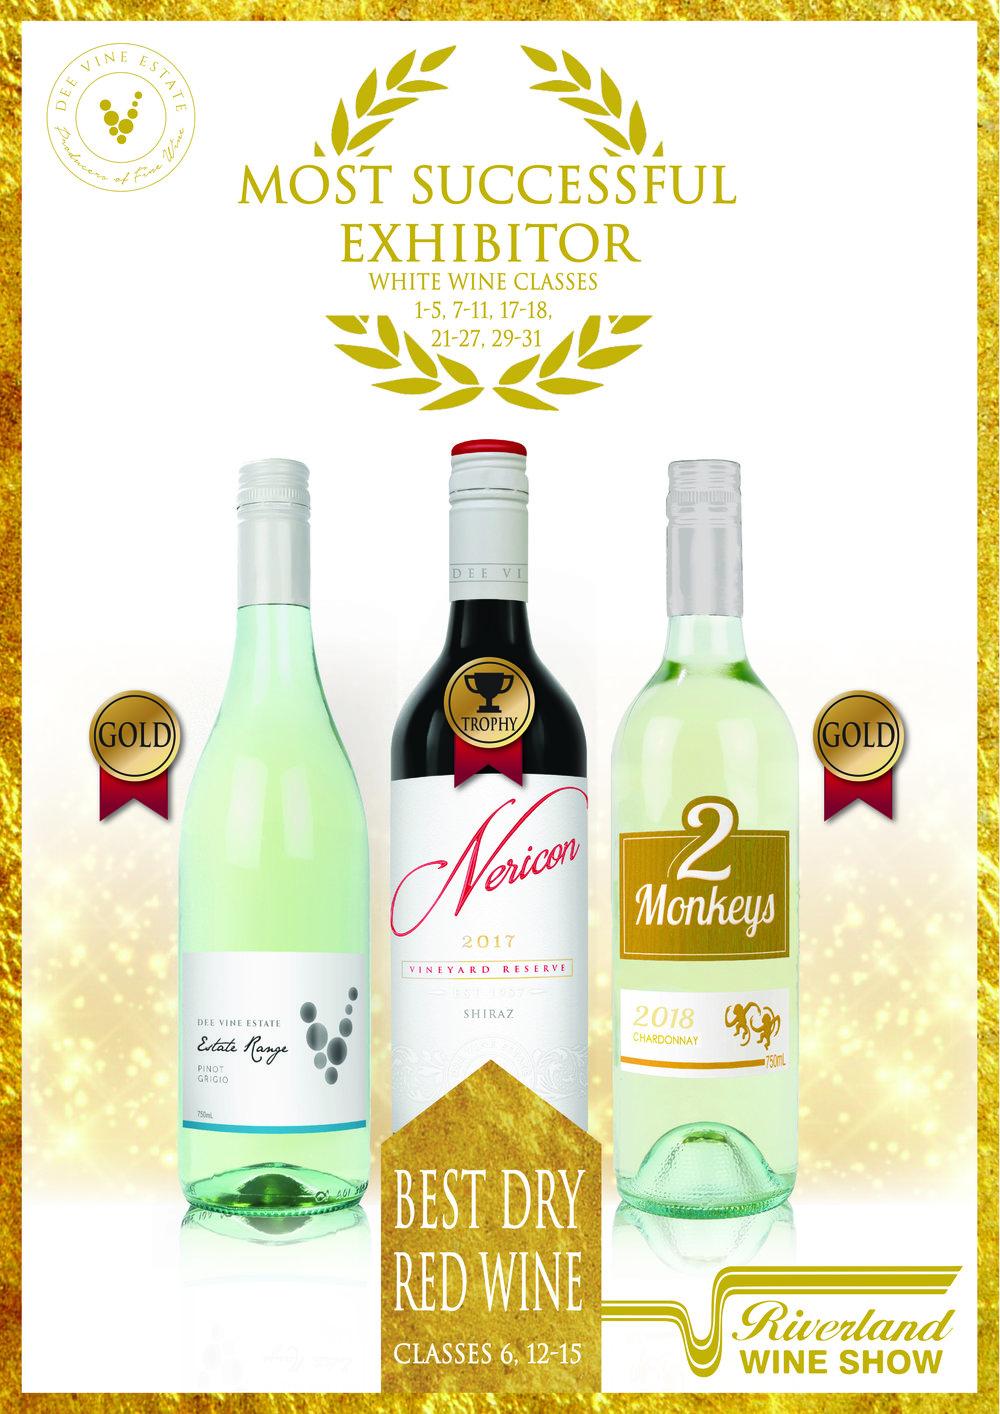 Riverland wine show (002).jpg